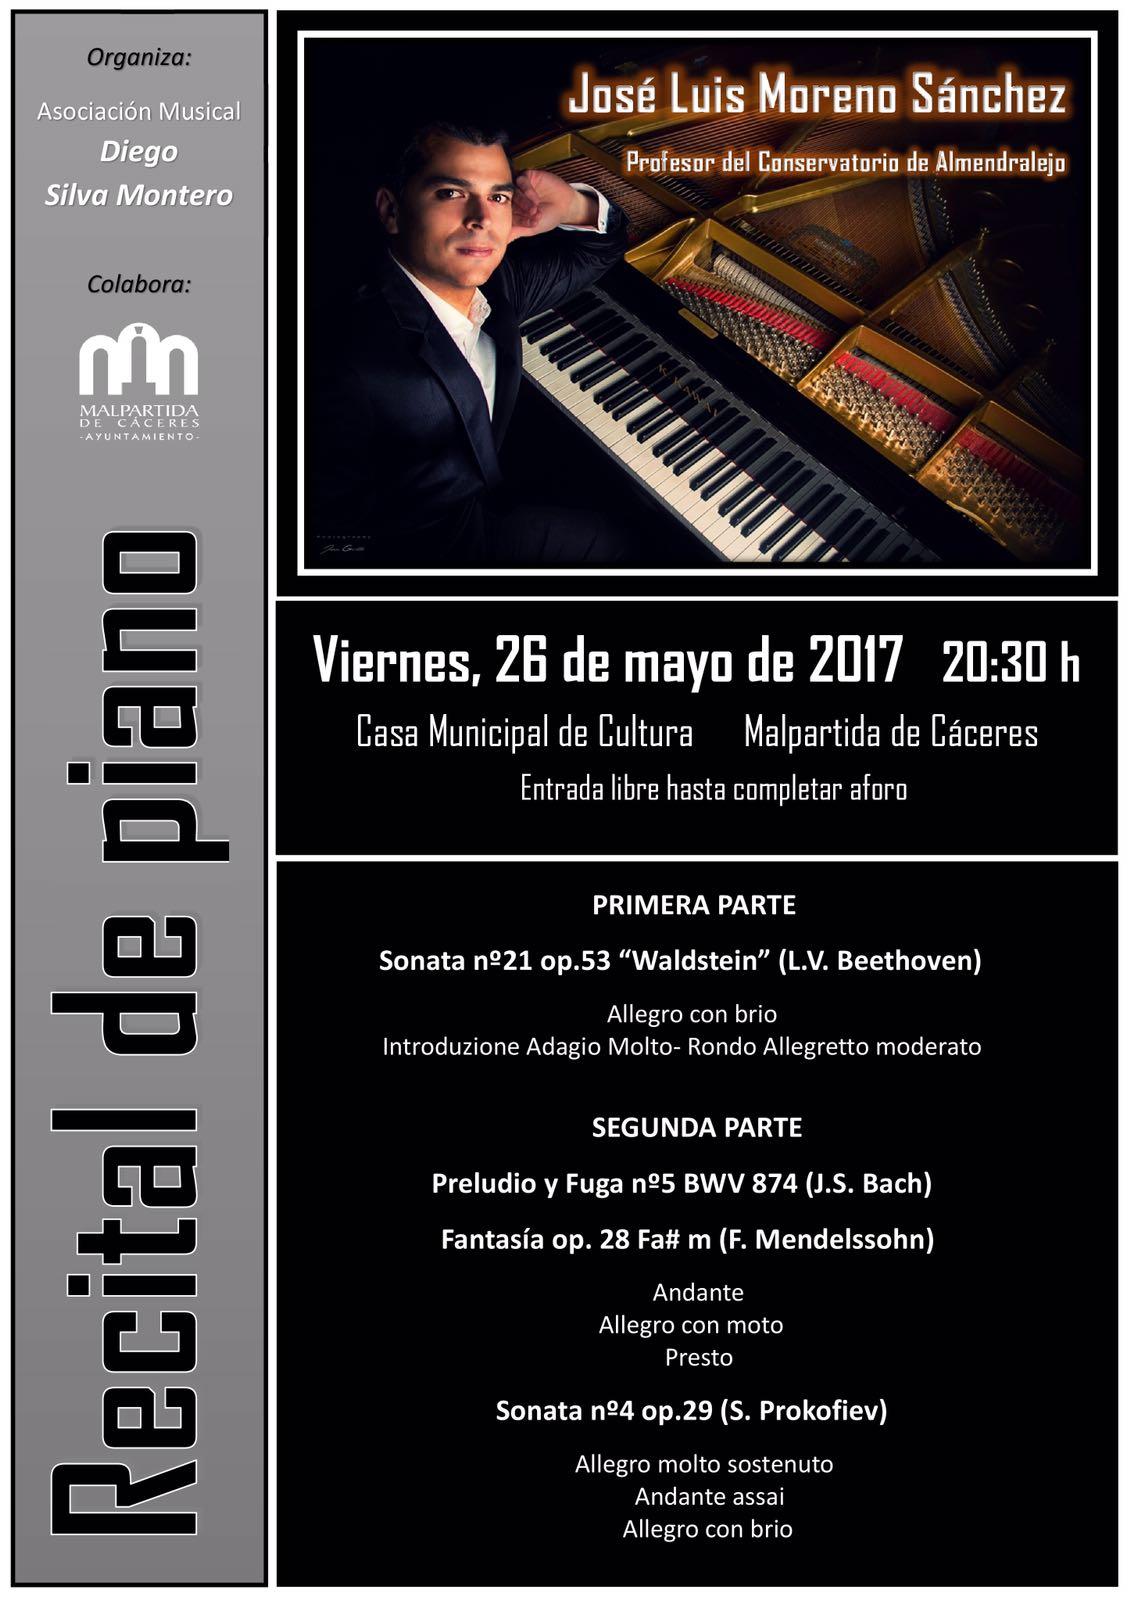 Recital de piano en Malpartida de Cáceres